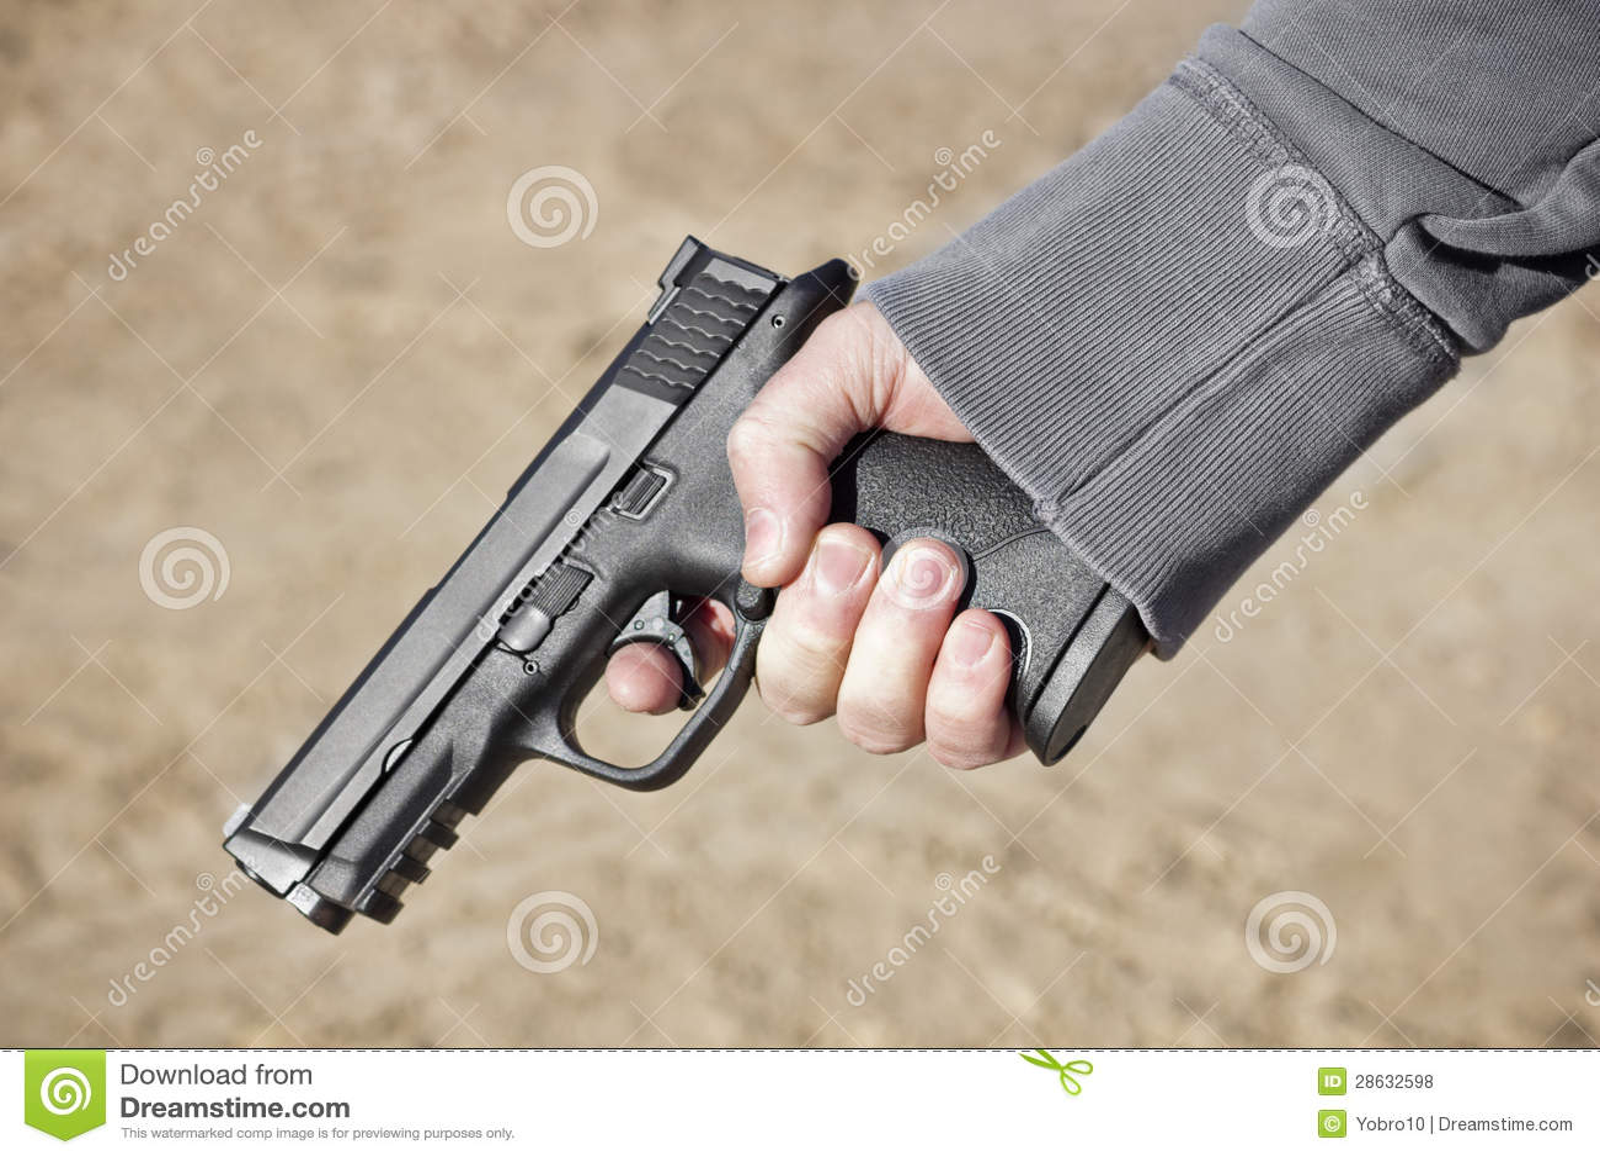 Hand Holding Pistol - Bing images